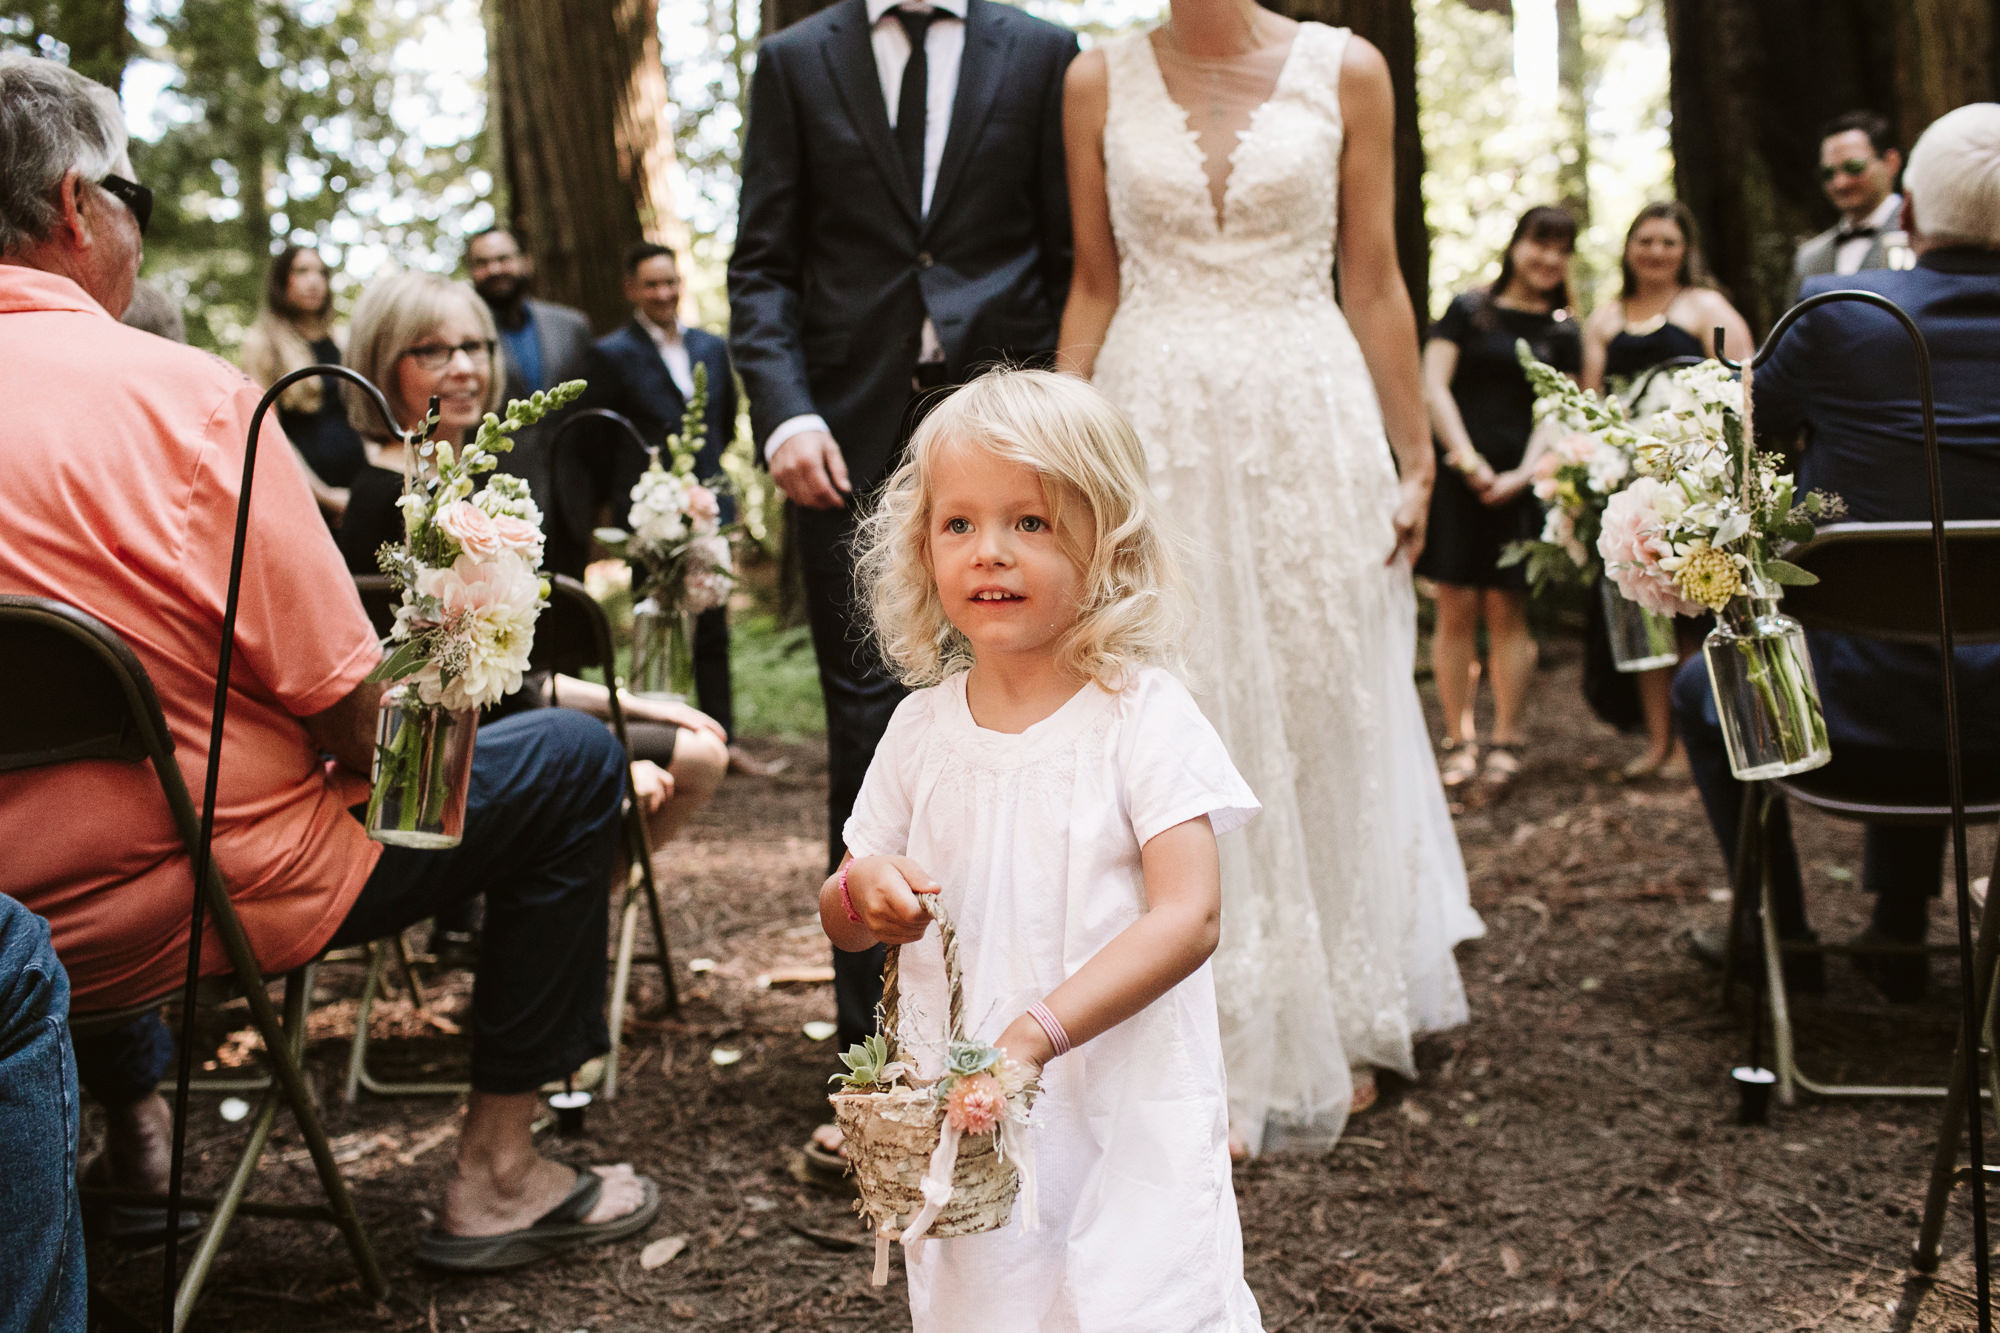 California-wedding-photographer-alfonso-flores-pamplin-groove-212.jpg